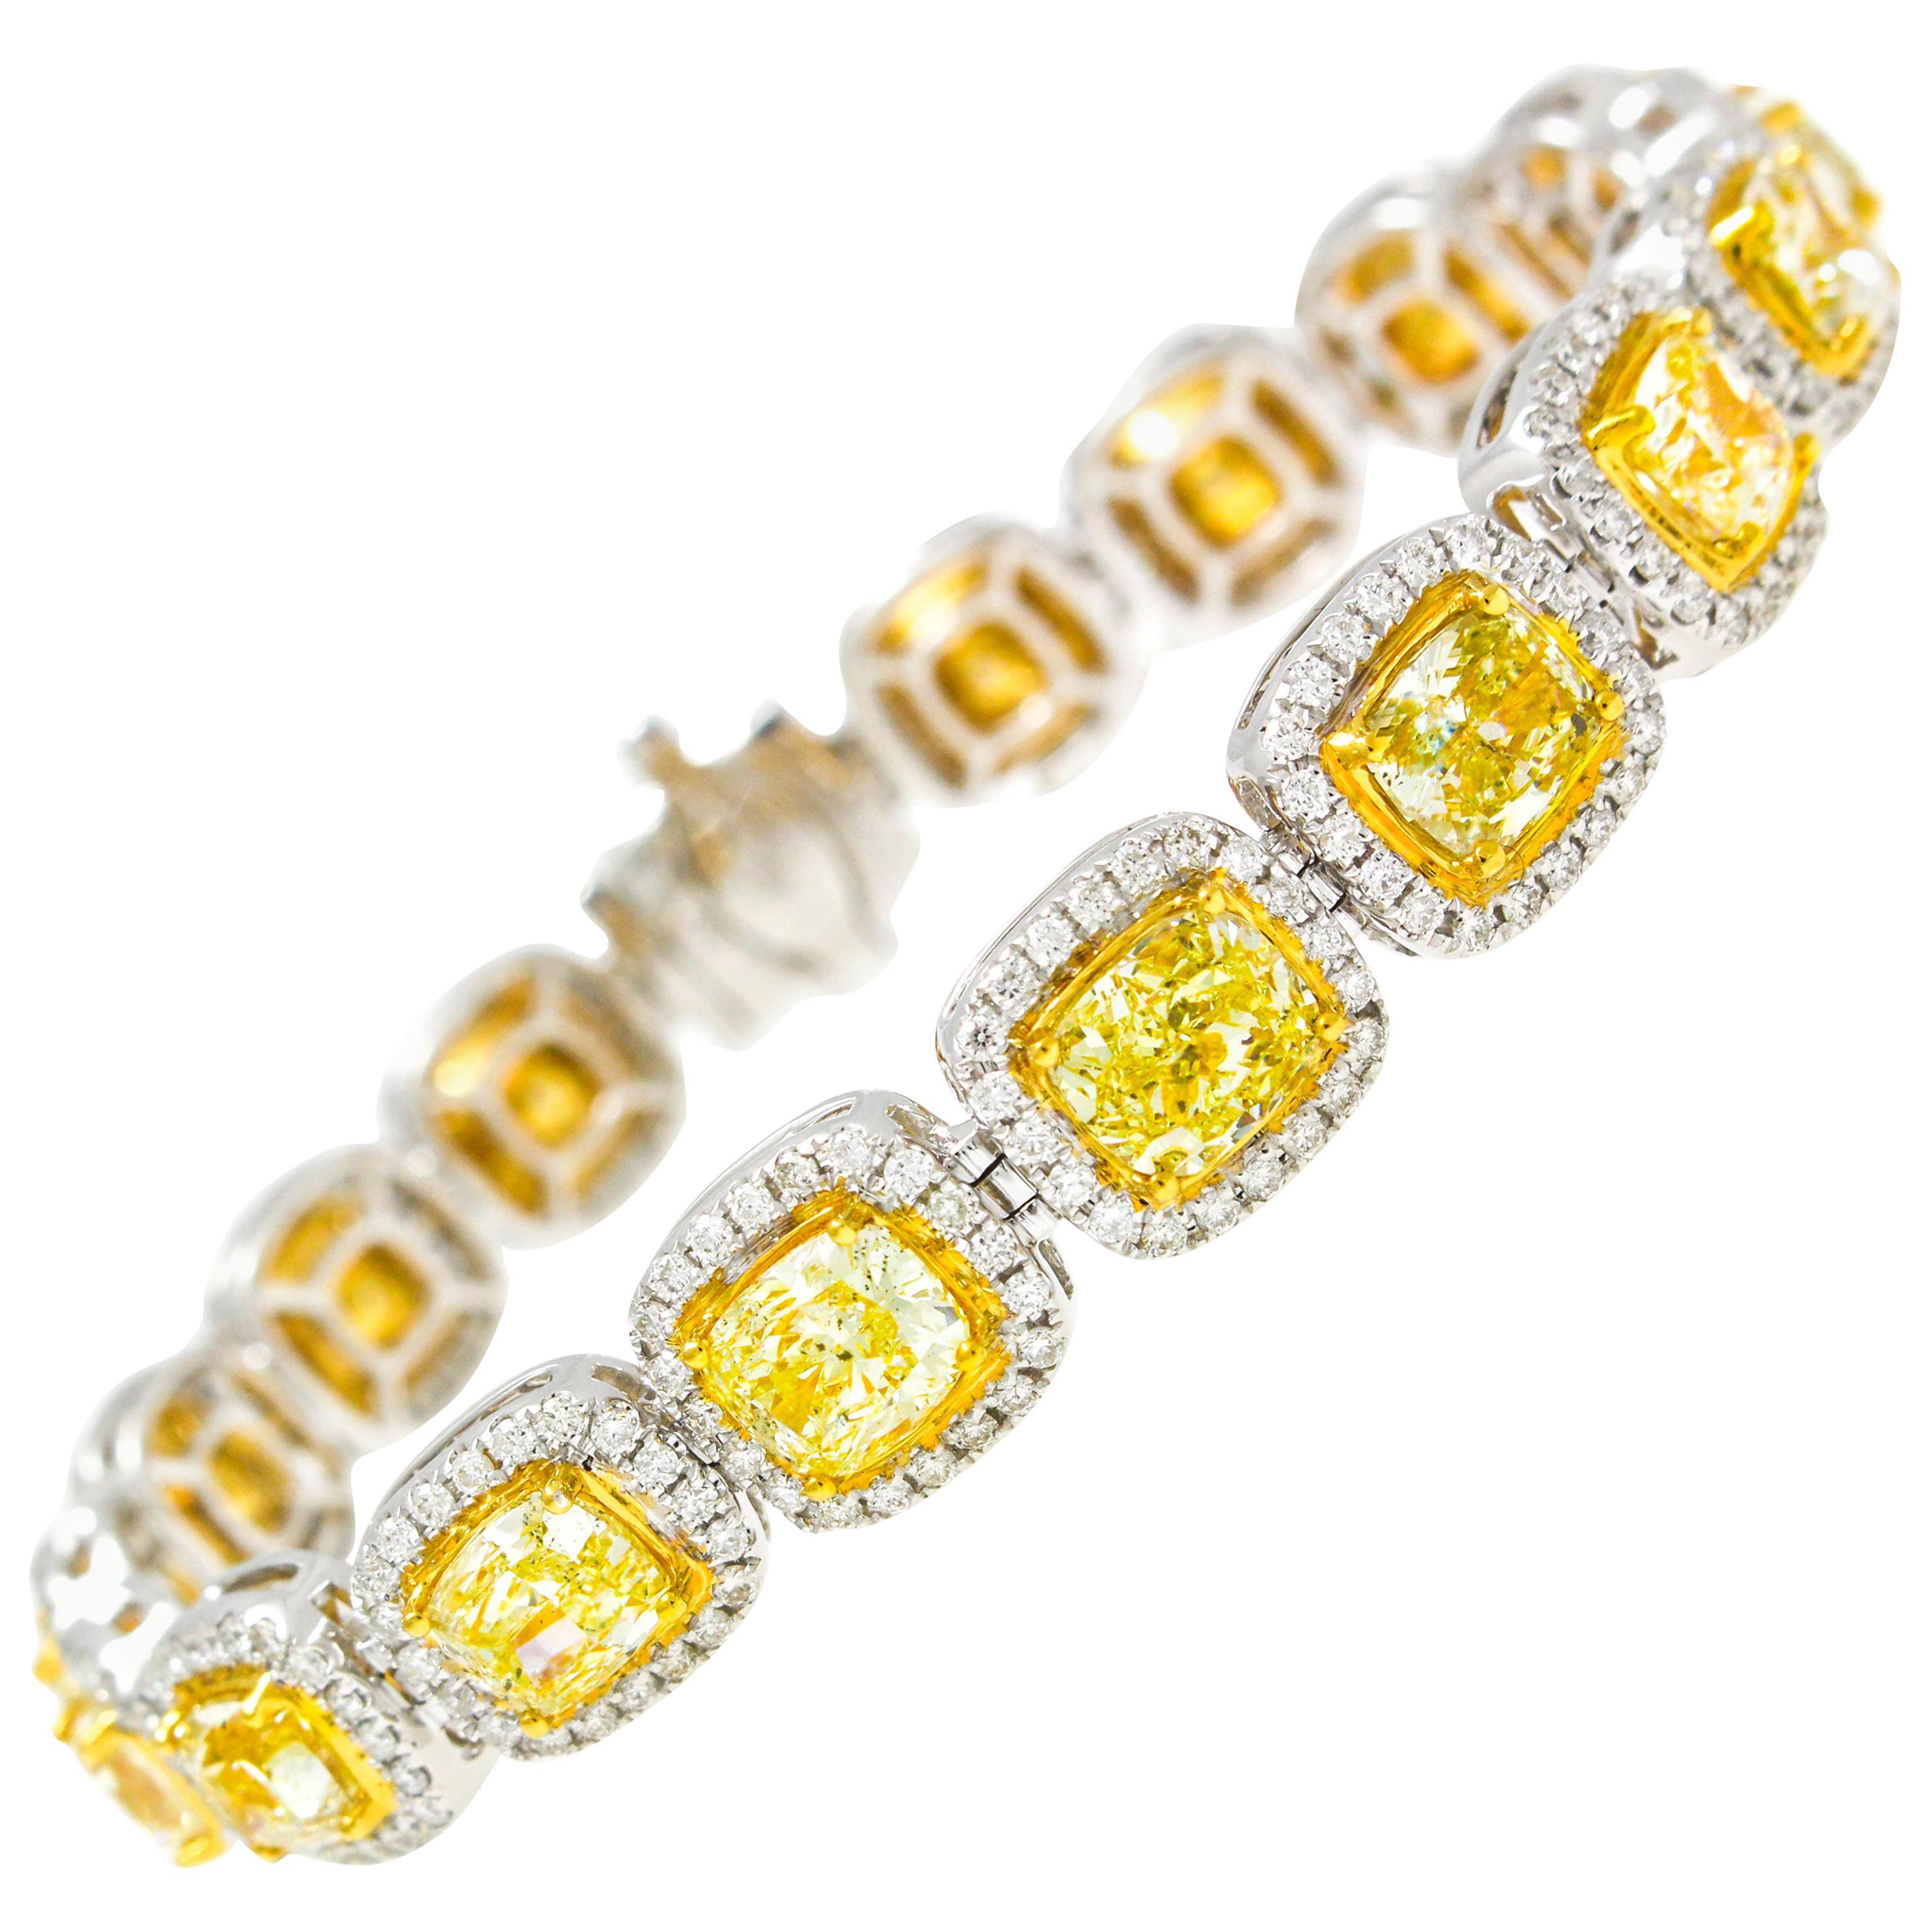 19.00 Carat Cushion Cut Yellow and White Diamond Bracelet